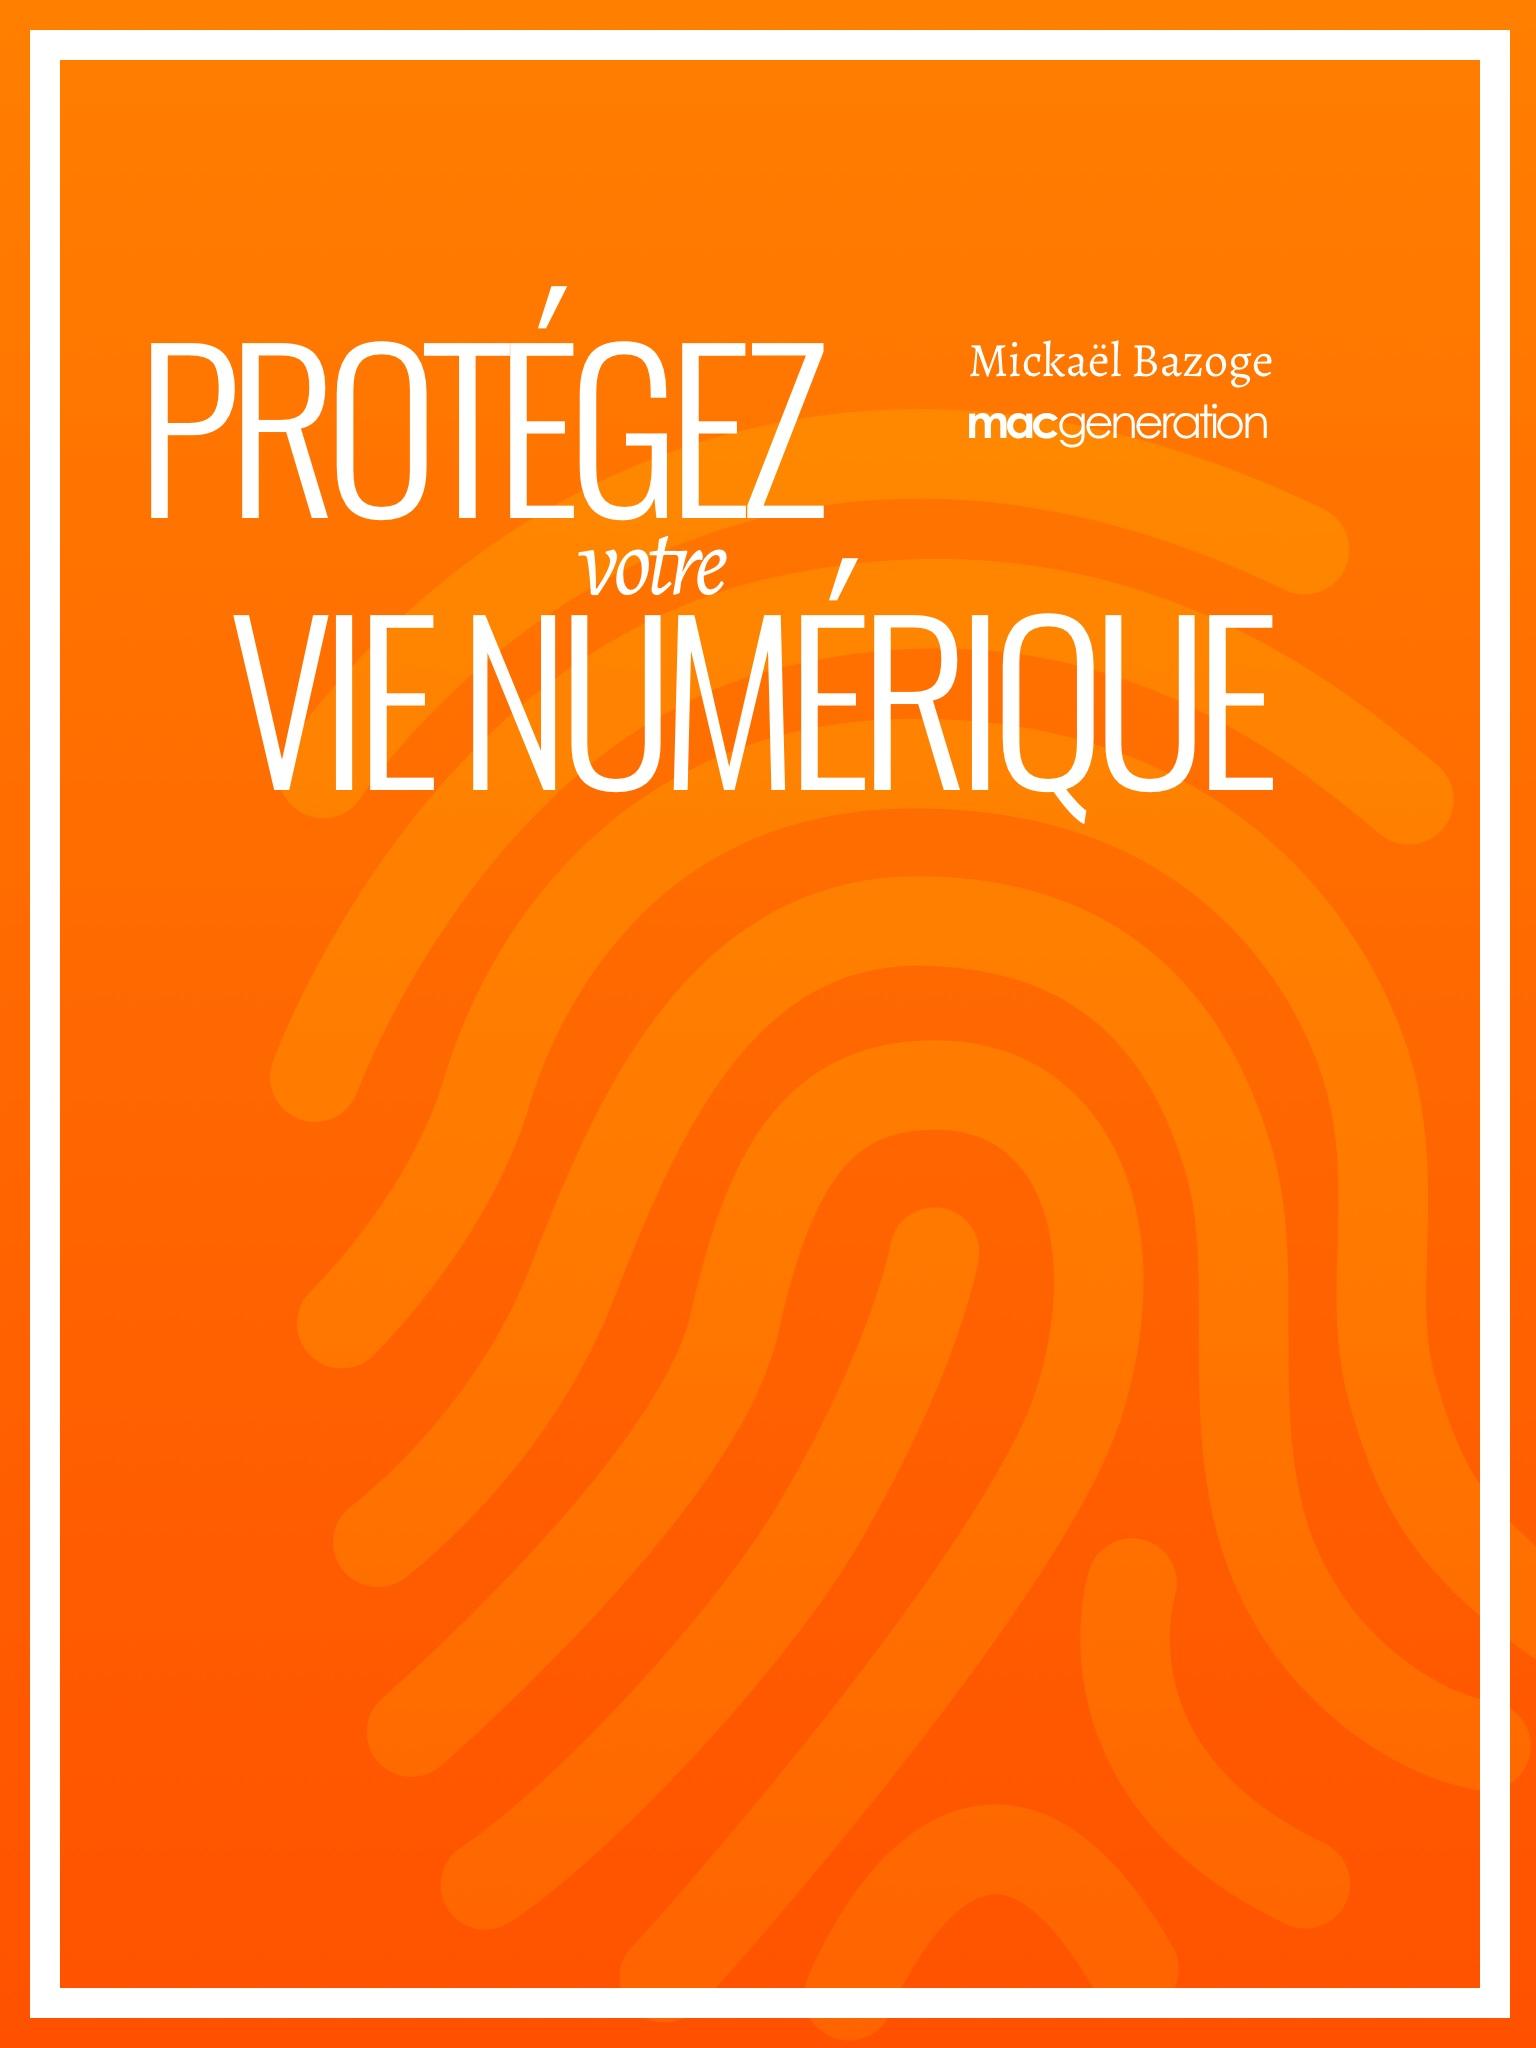 livres/savoir-protegez.jpg